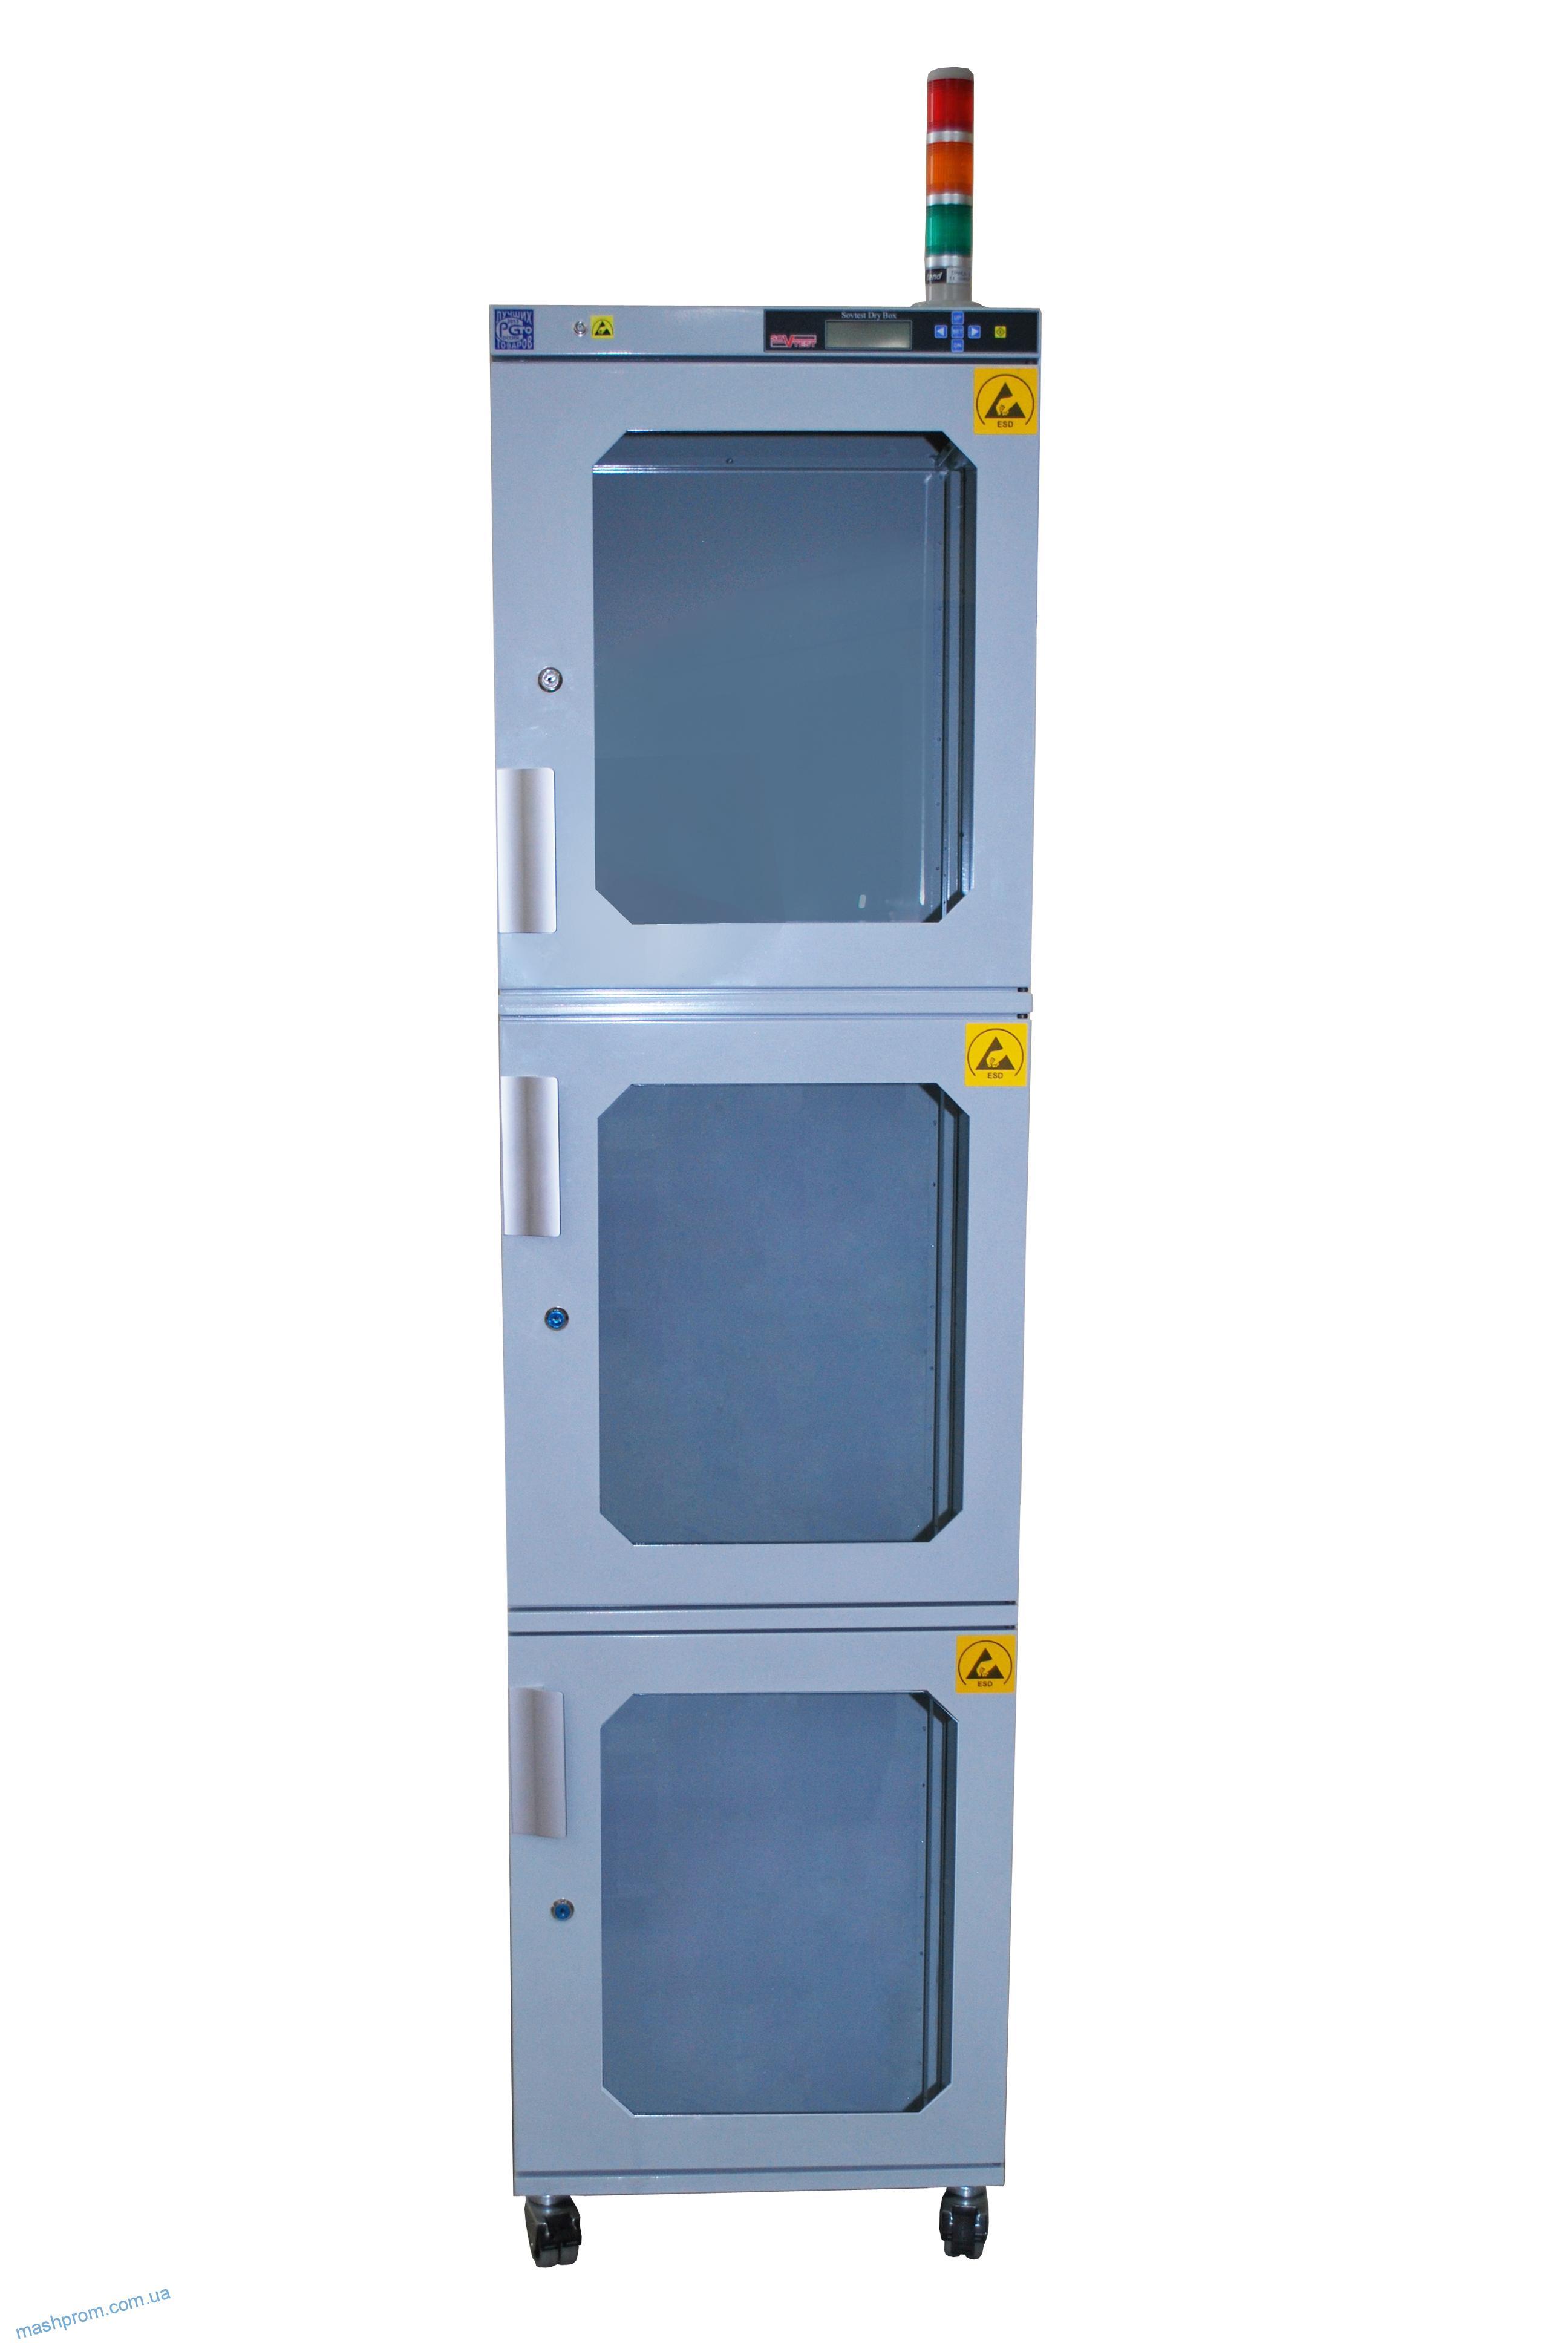 Шкаф сухого хранения SDB702 ДИ с функцией автоматизации